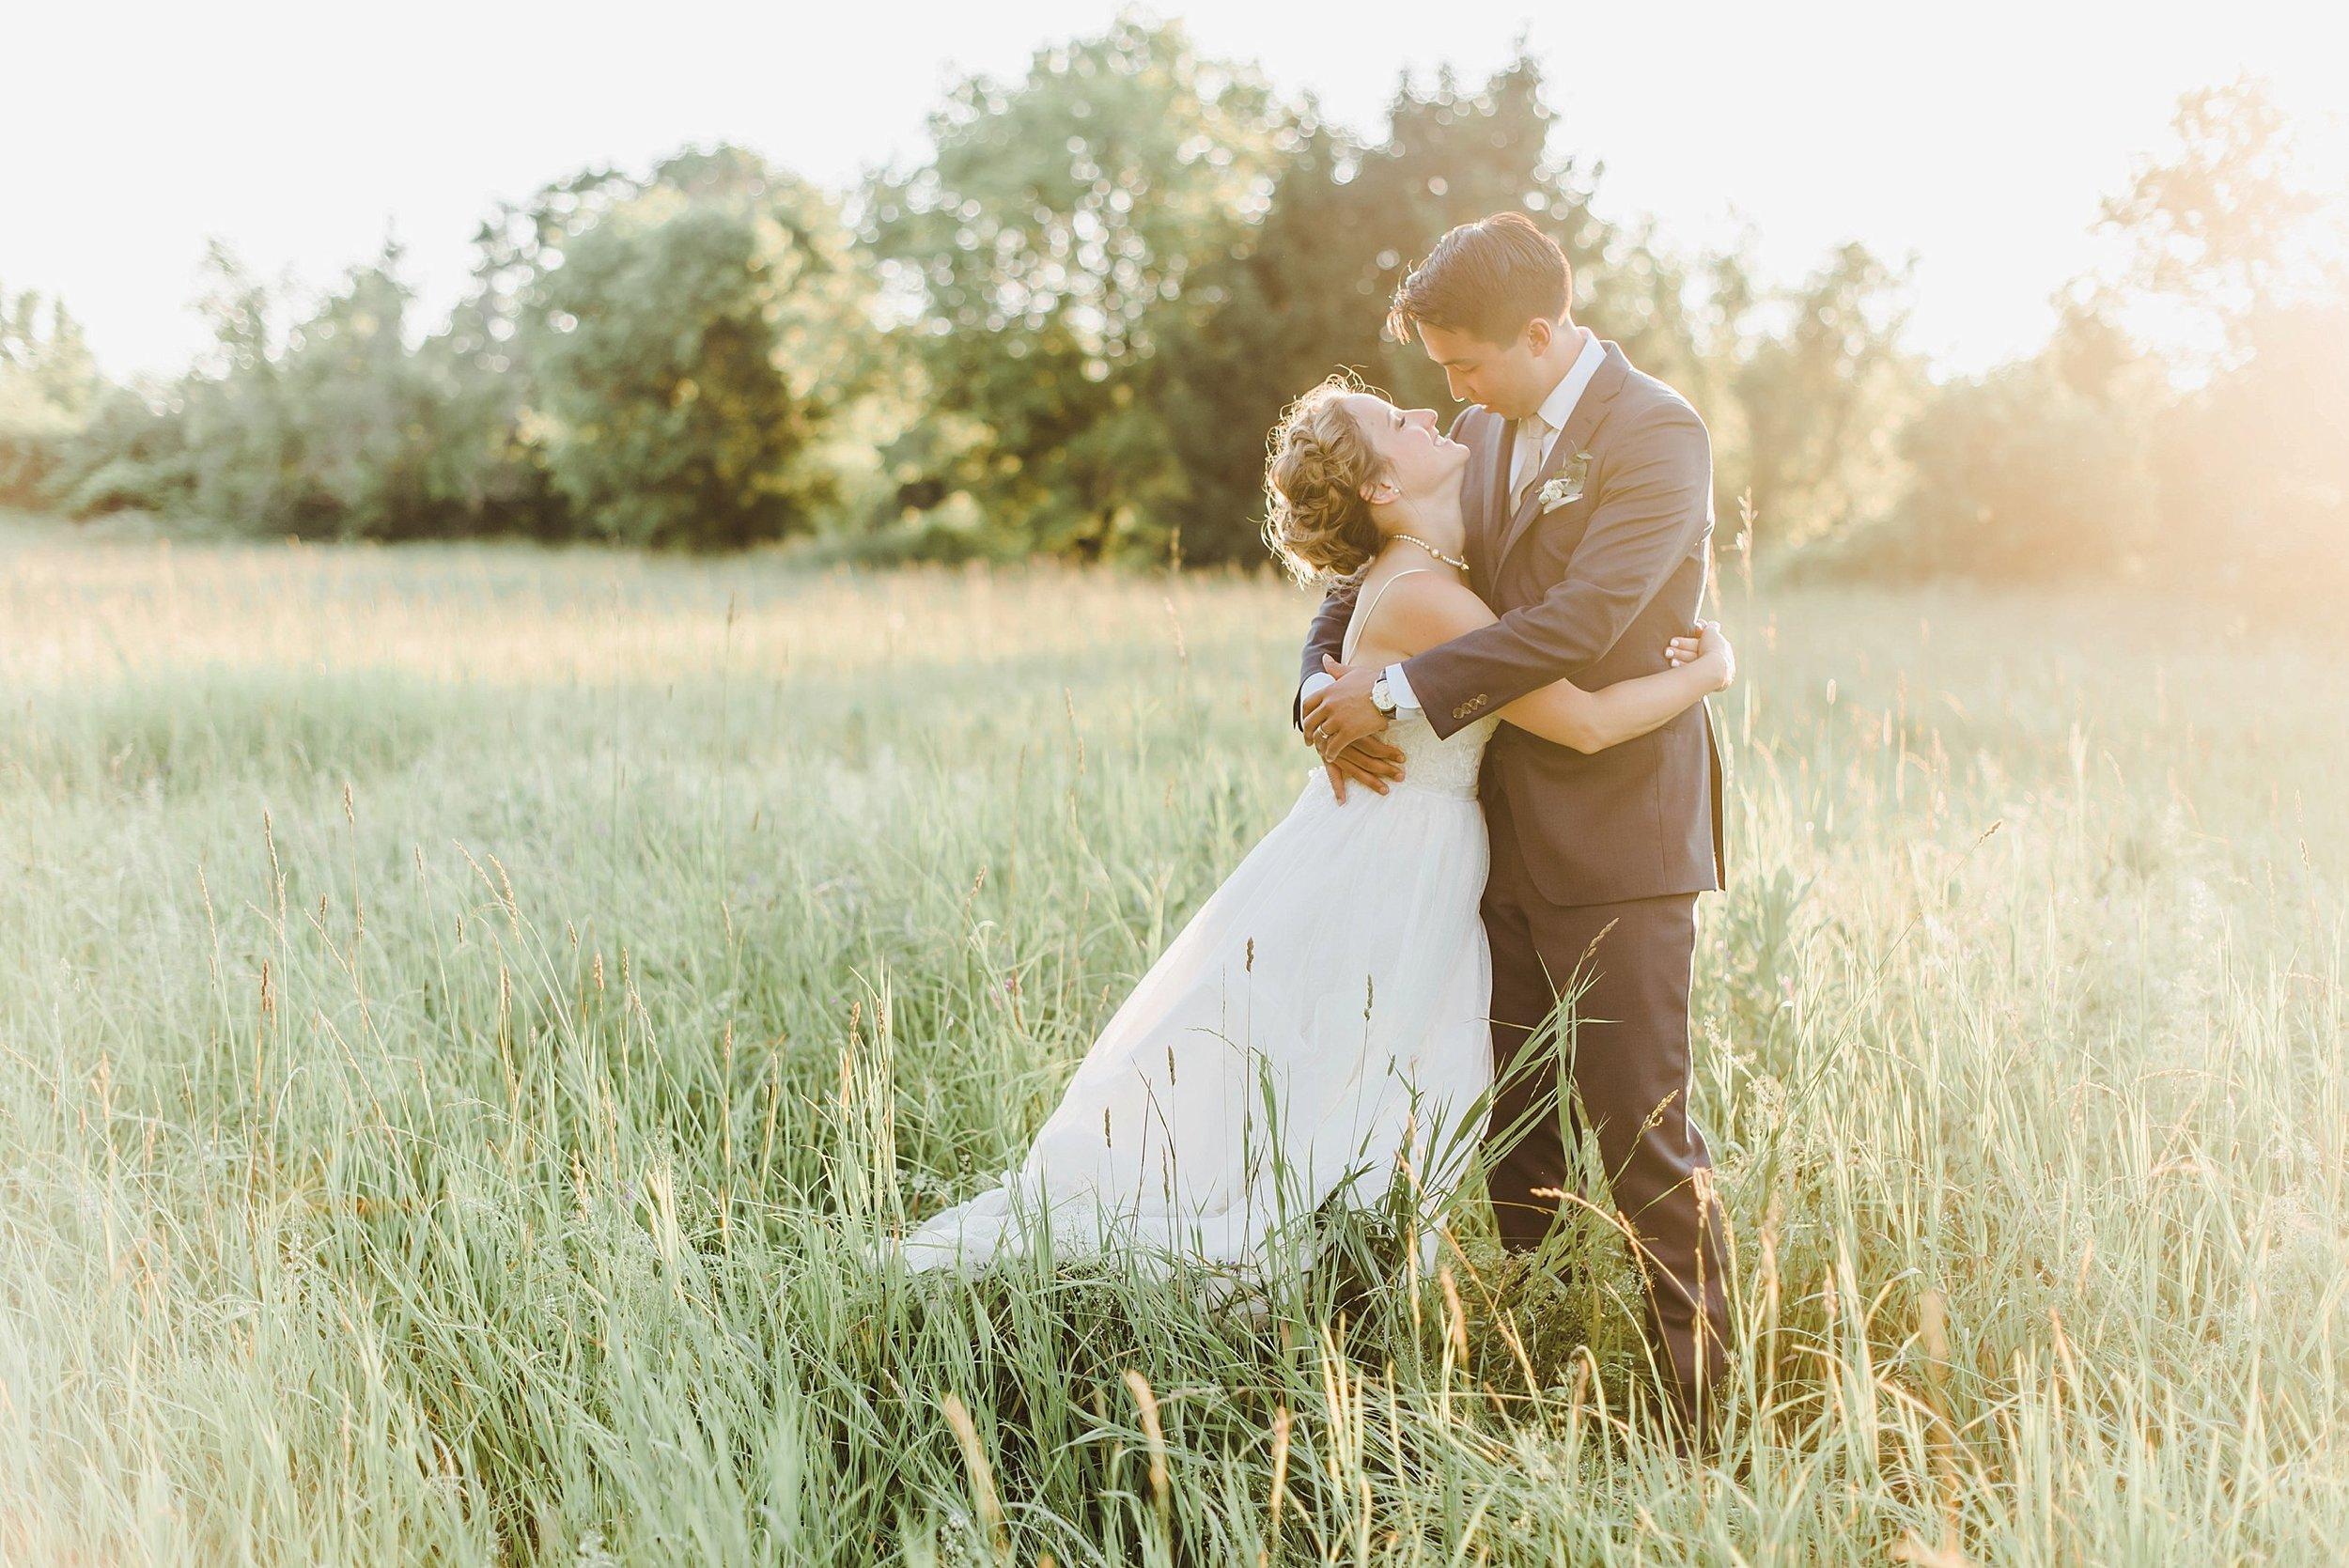 light airy indie fine art ottawa wedding photographer | Ali and Batoul Photography_0905.jpg